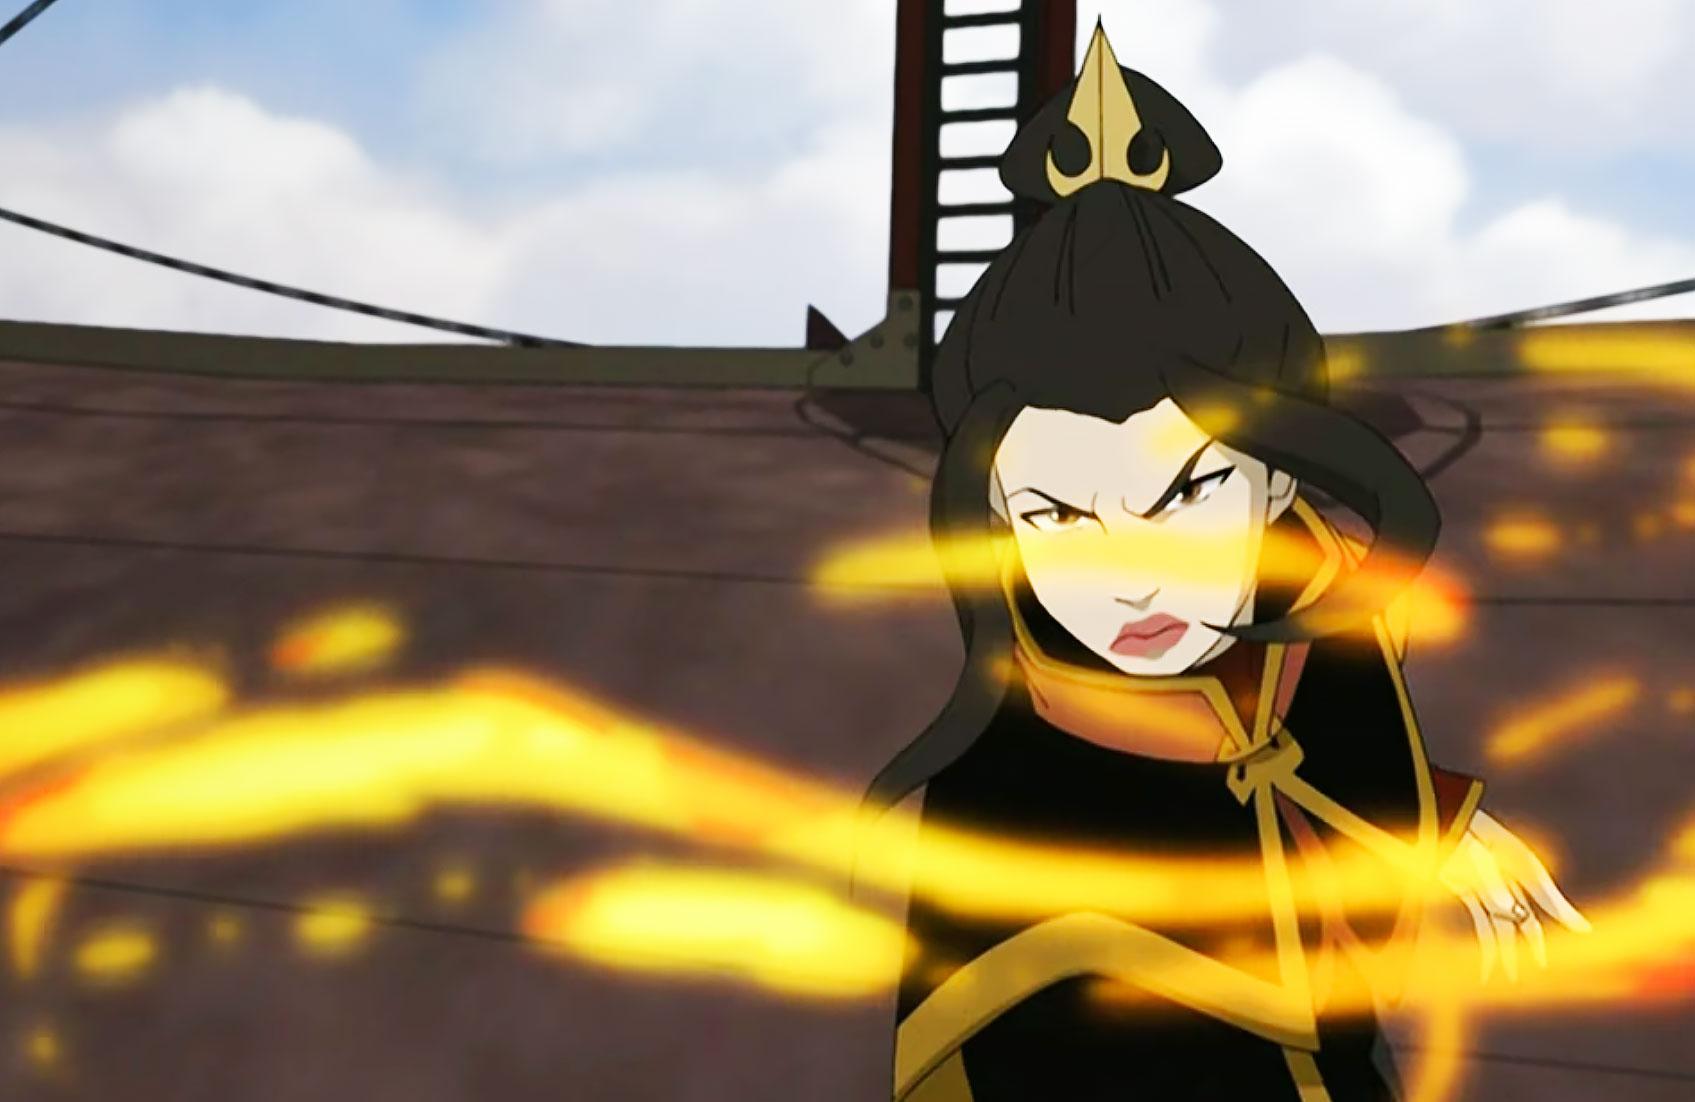 azula firebending in avatar